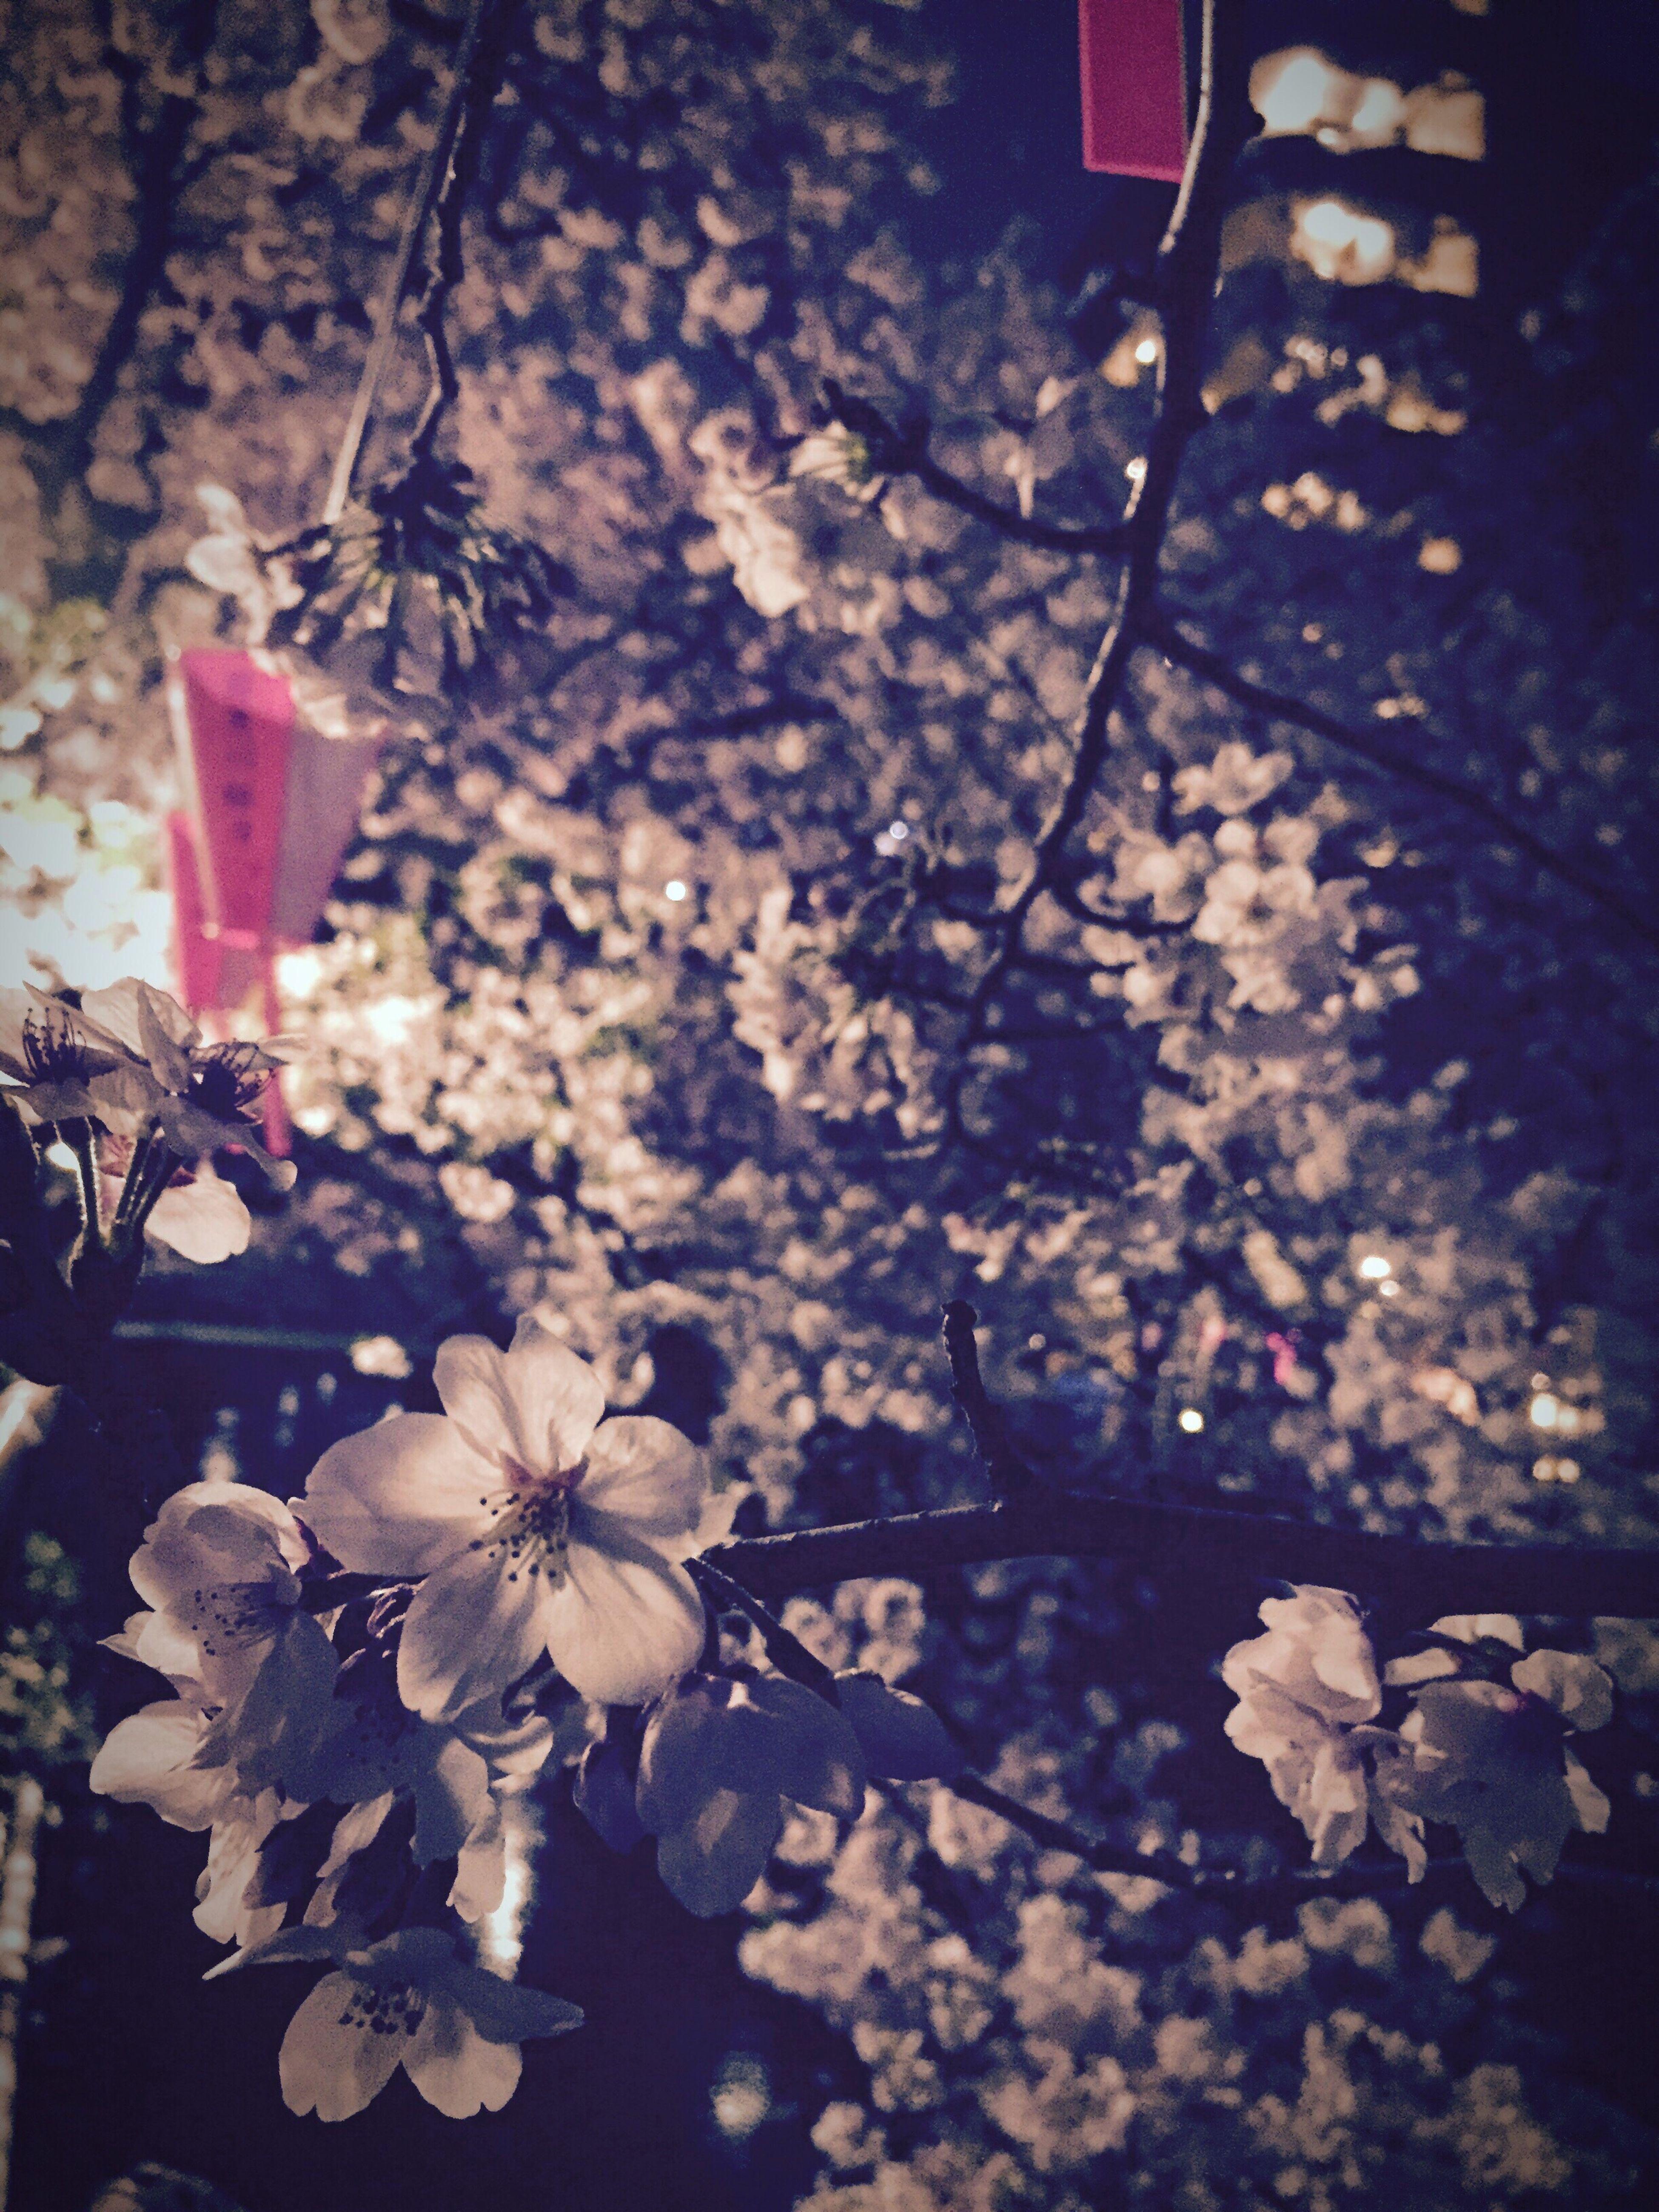 Lovely Plase at Nakameguro Cherry Blossoms Showcase April